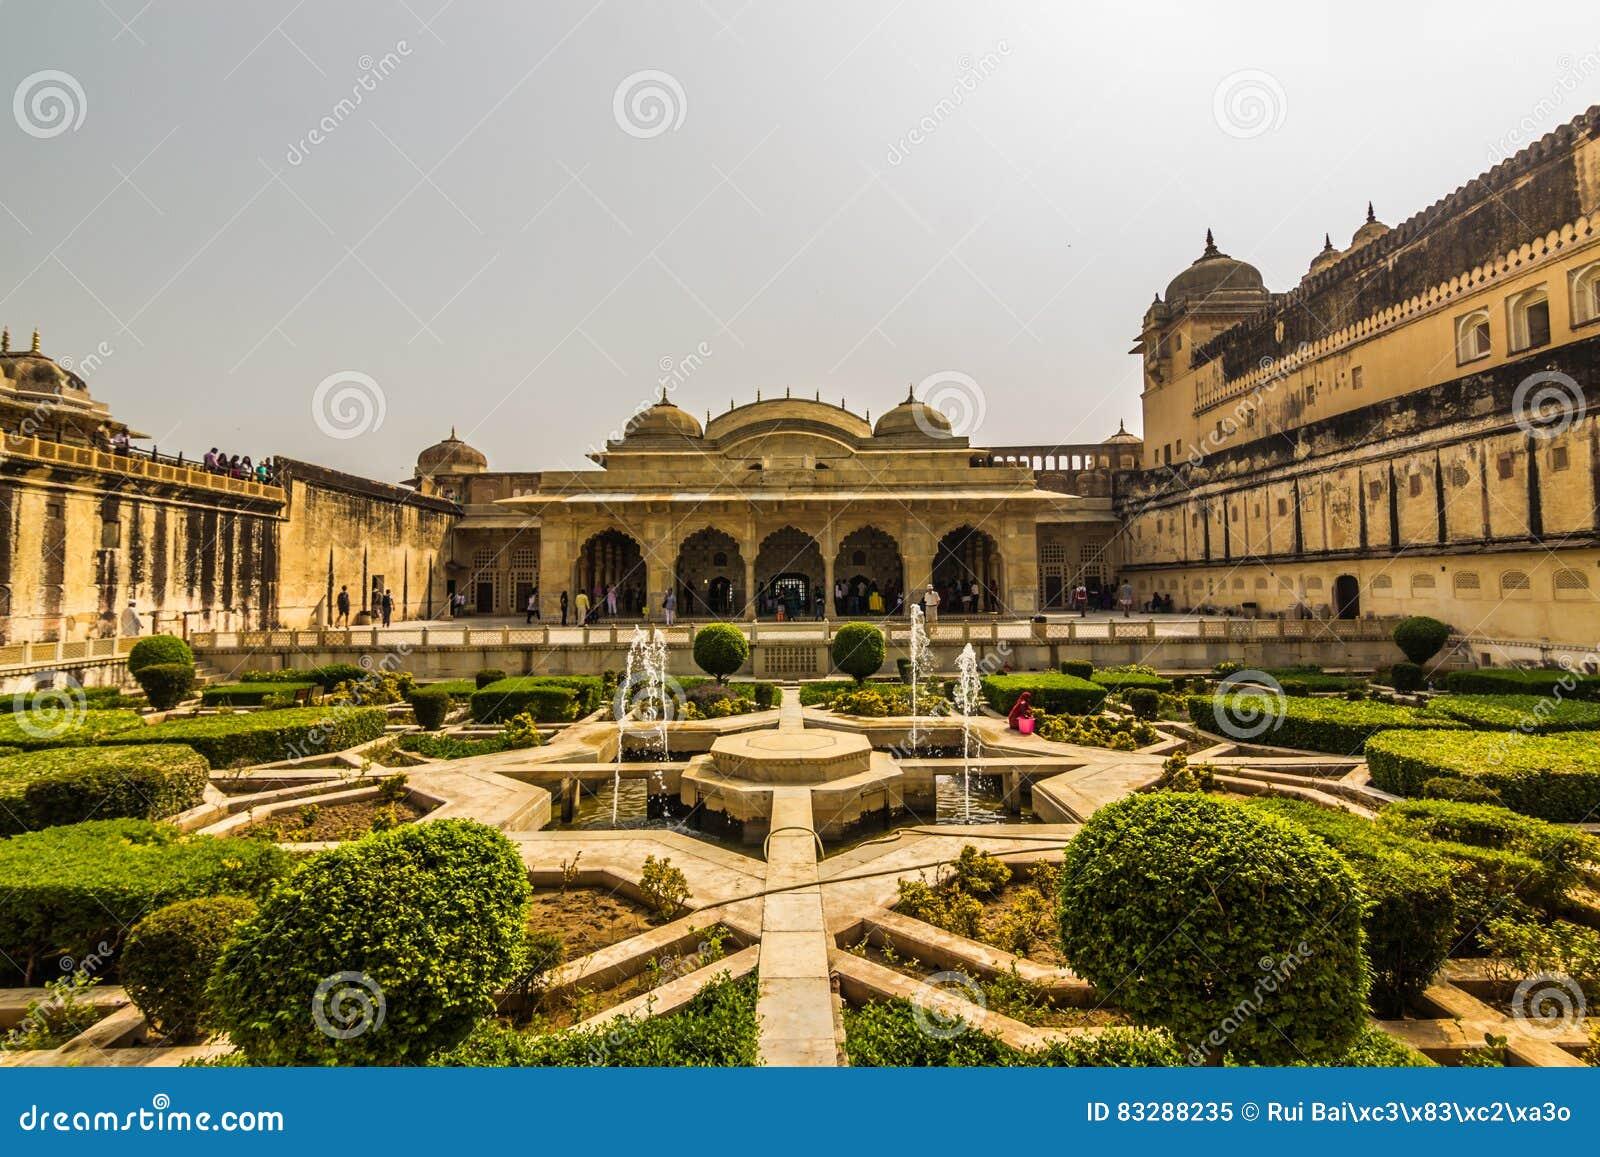 November 04, 2014: Gardens Of The Amber Fort In Jaipur, India ...